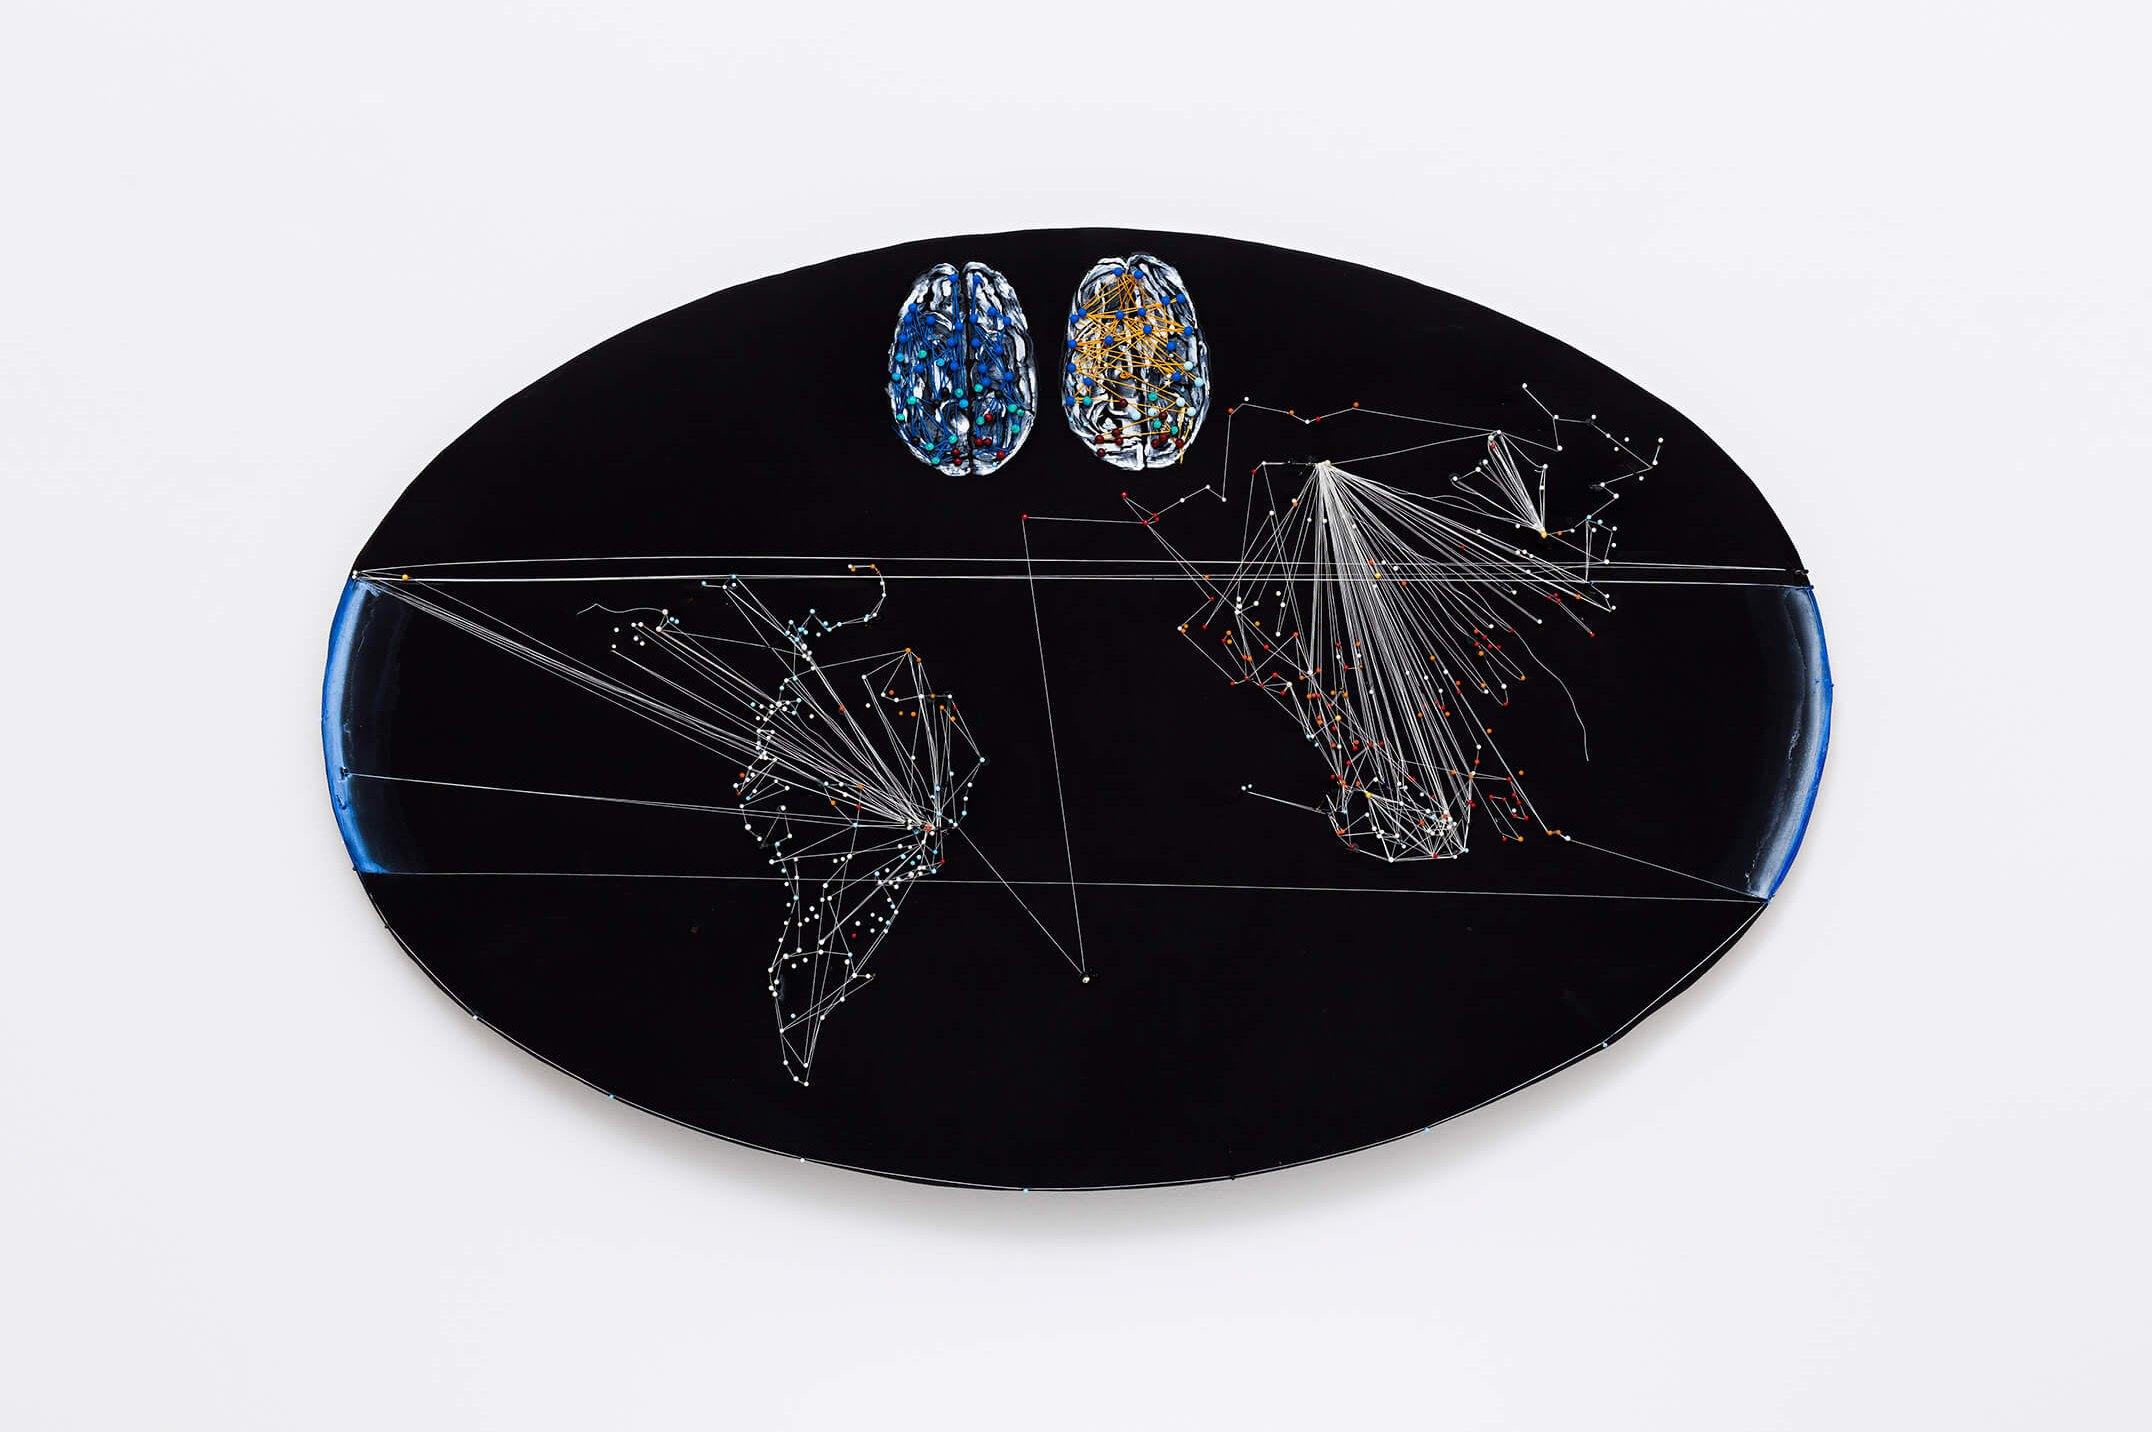 Anna Bella Geiger,<em>EW18 com Pólos, from Macios series</em>, 2014,acrylic on canvas, threads and pins,98 × 59 cm - Mendes Wood DM